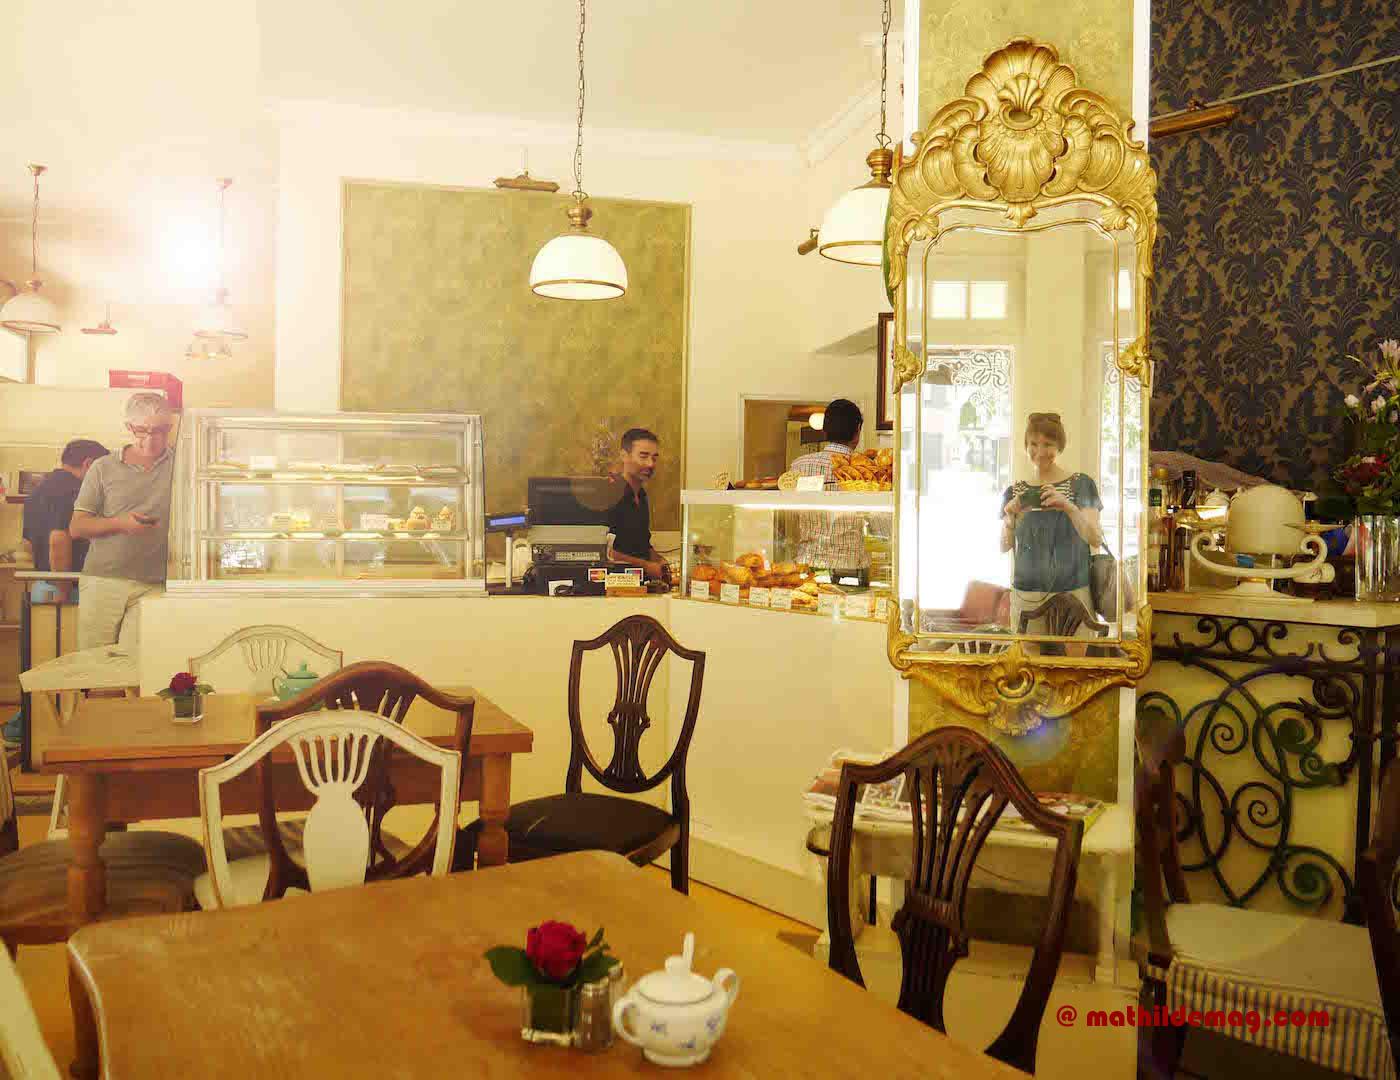 Menschen im Café